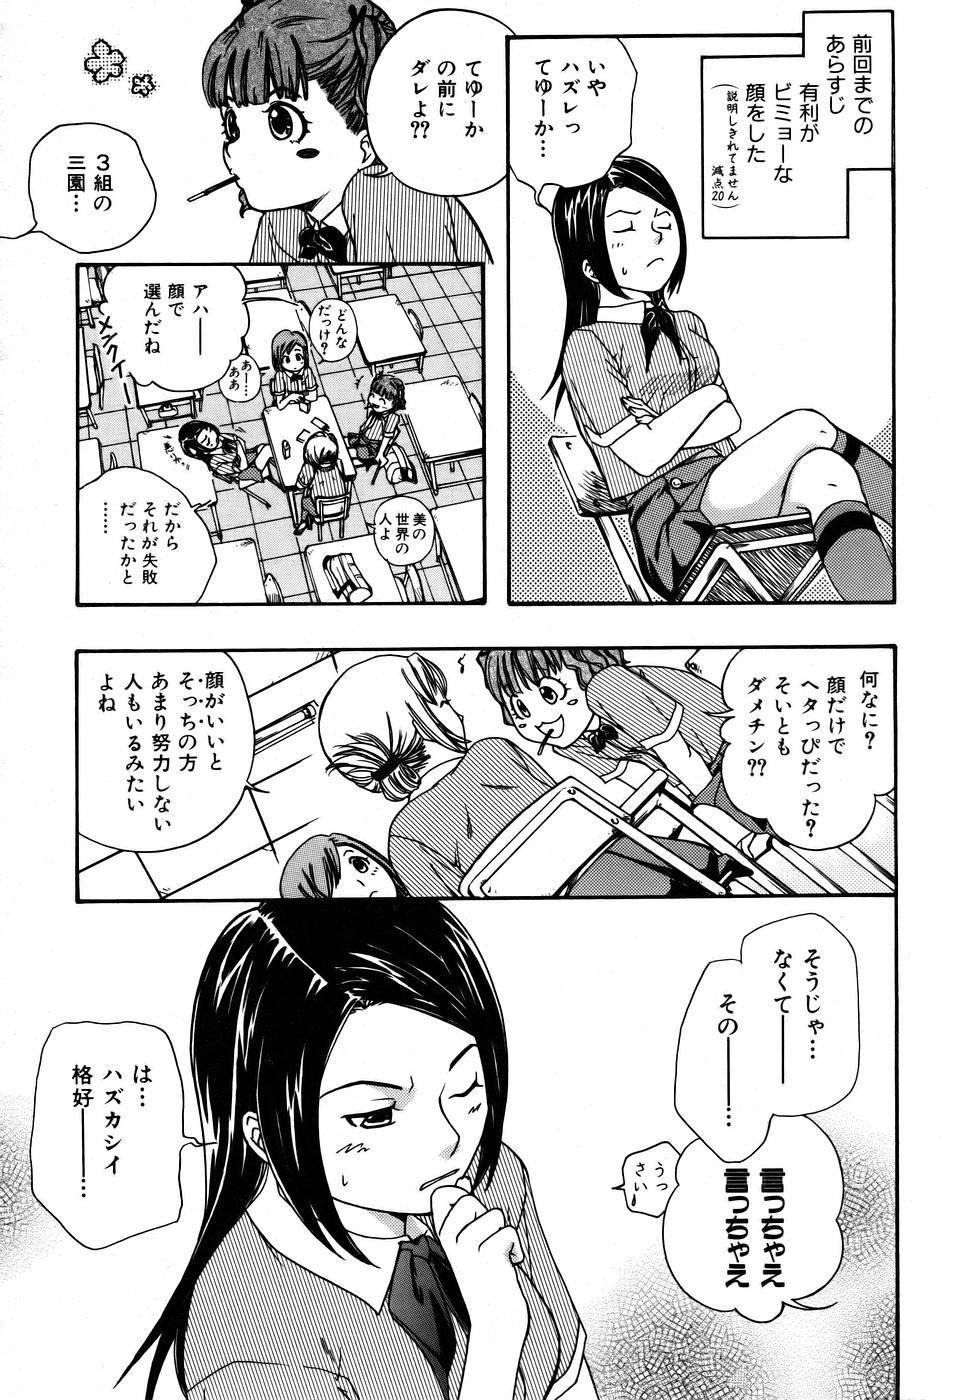 COMIC AUN 2005-12 Vol. 115 236